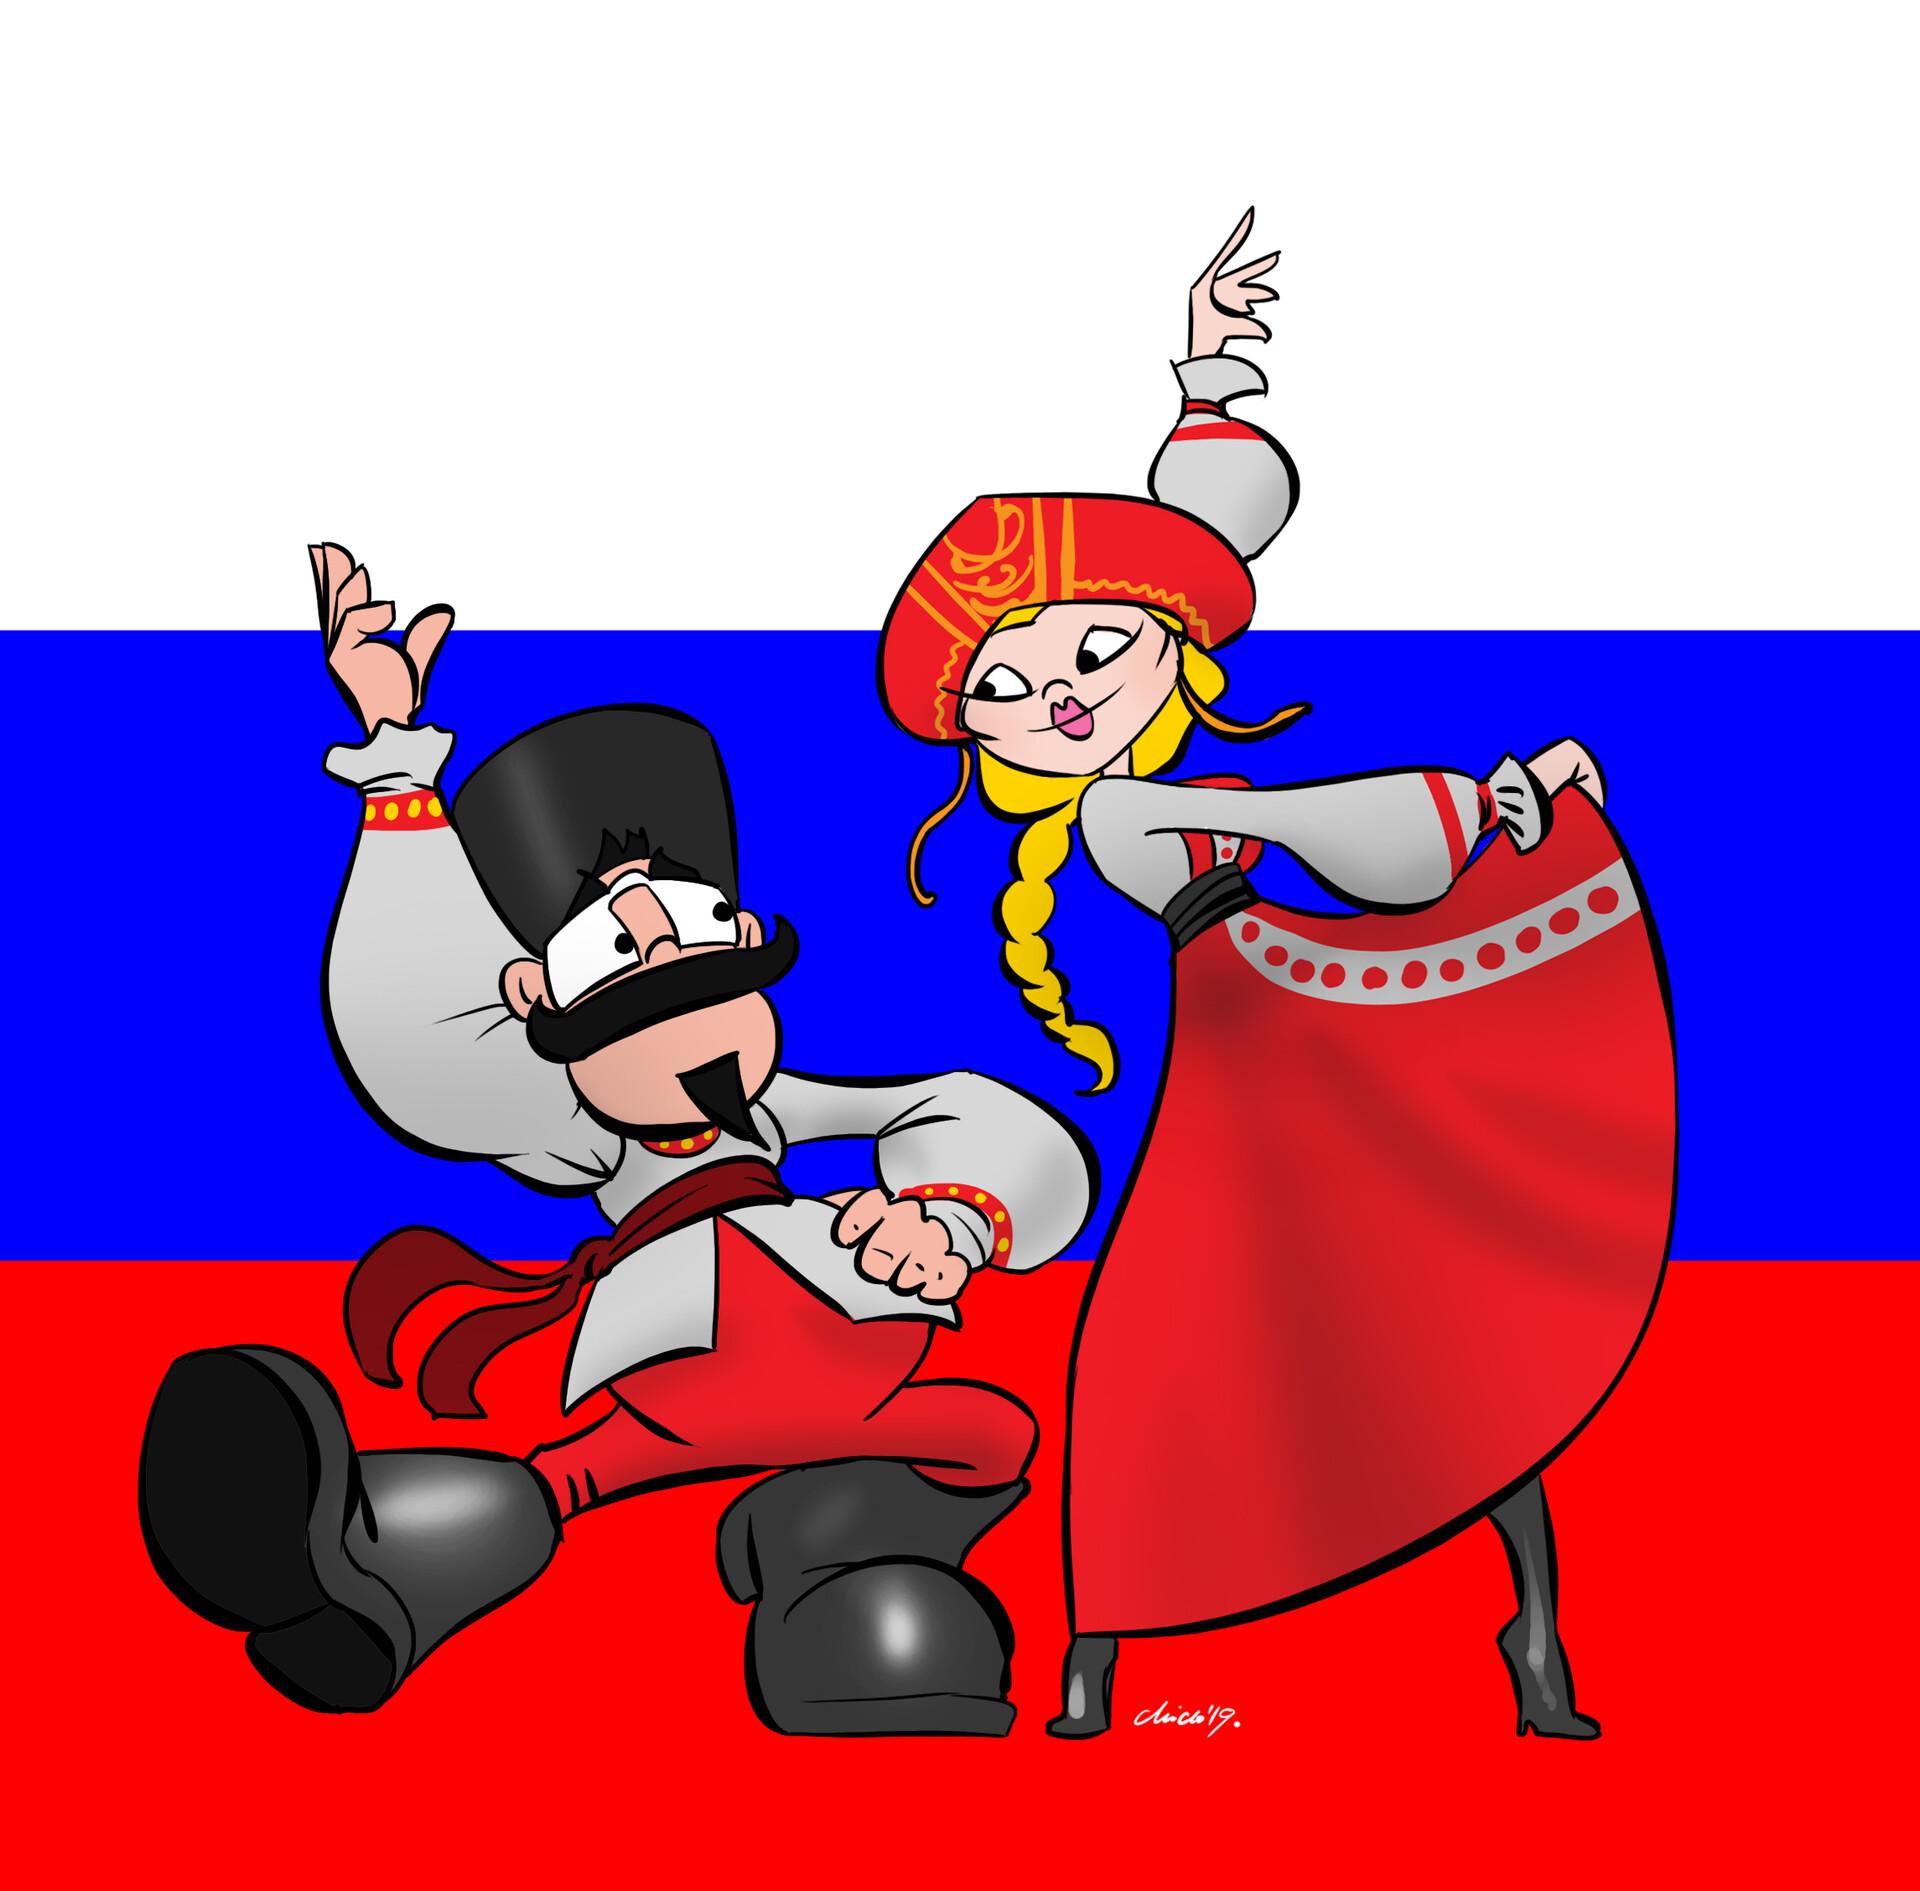 Midhat kapetanovic beba world russia